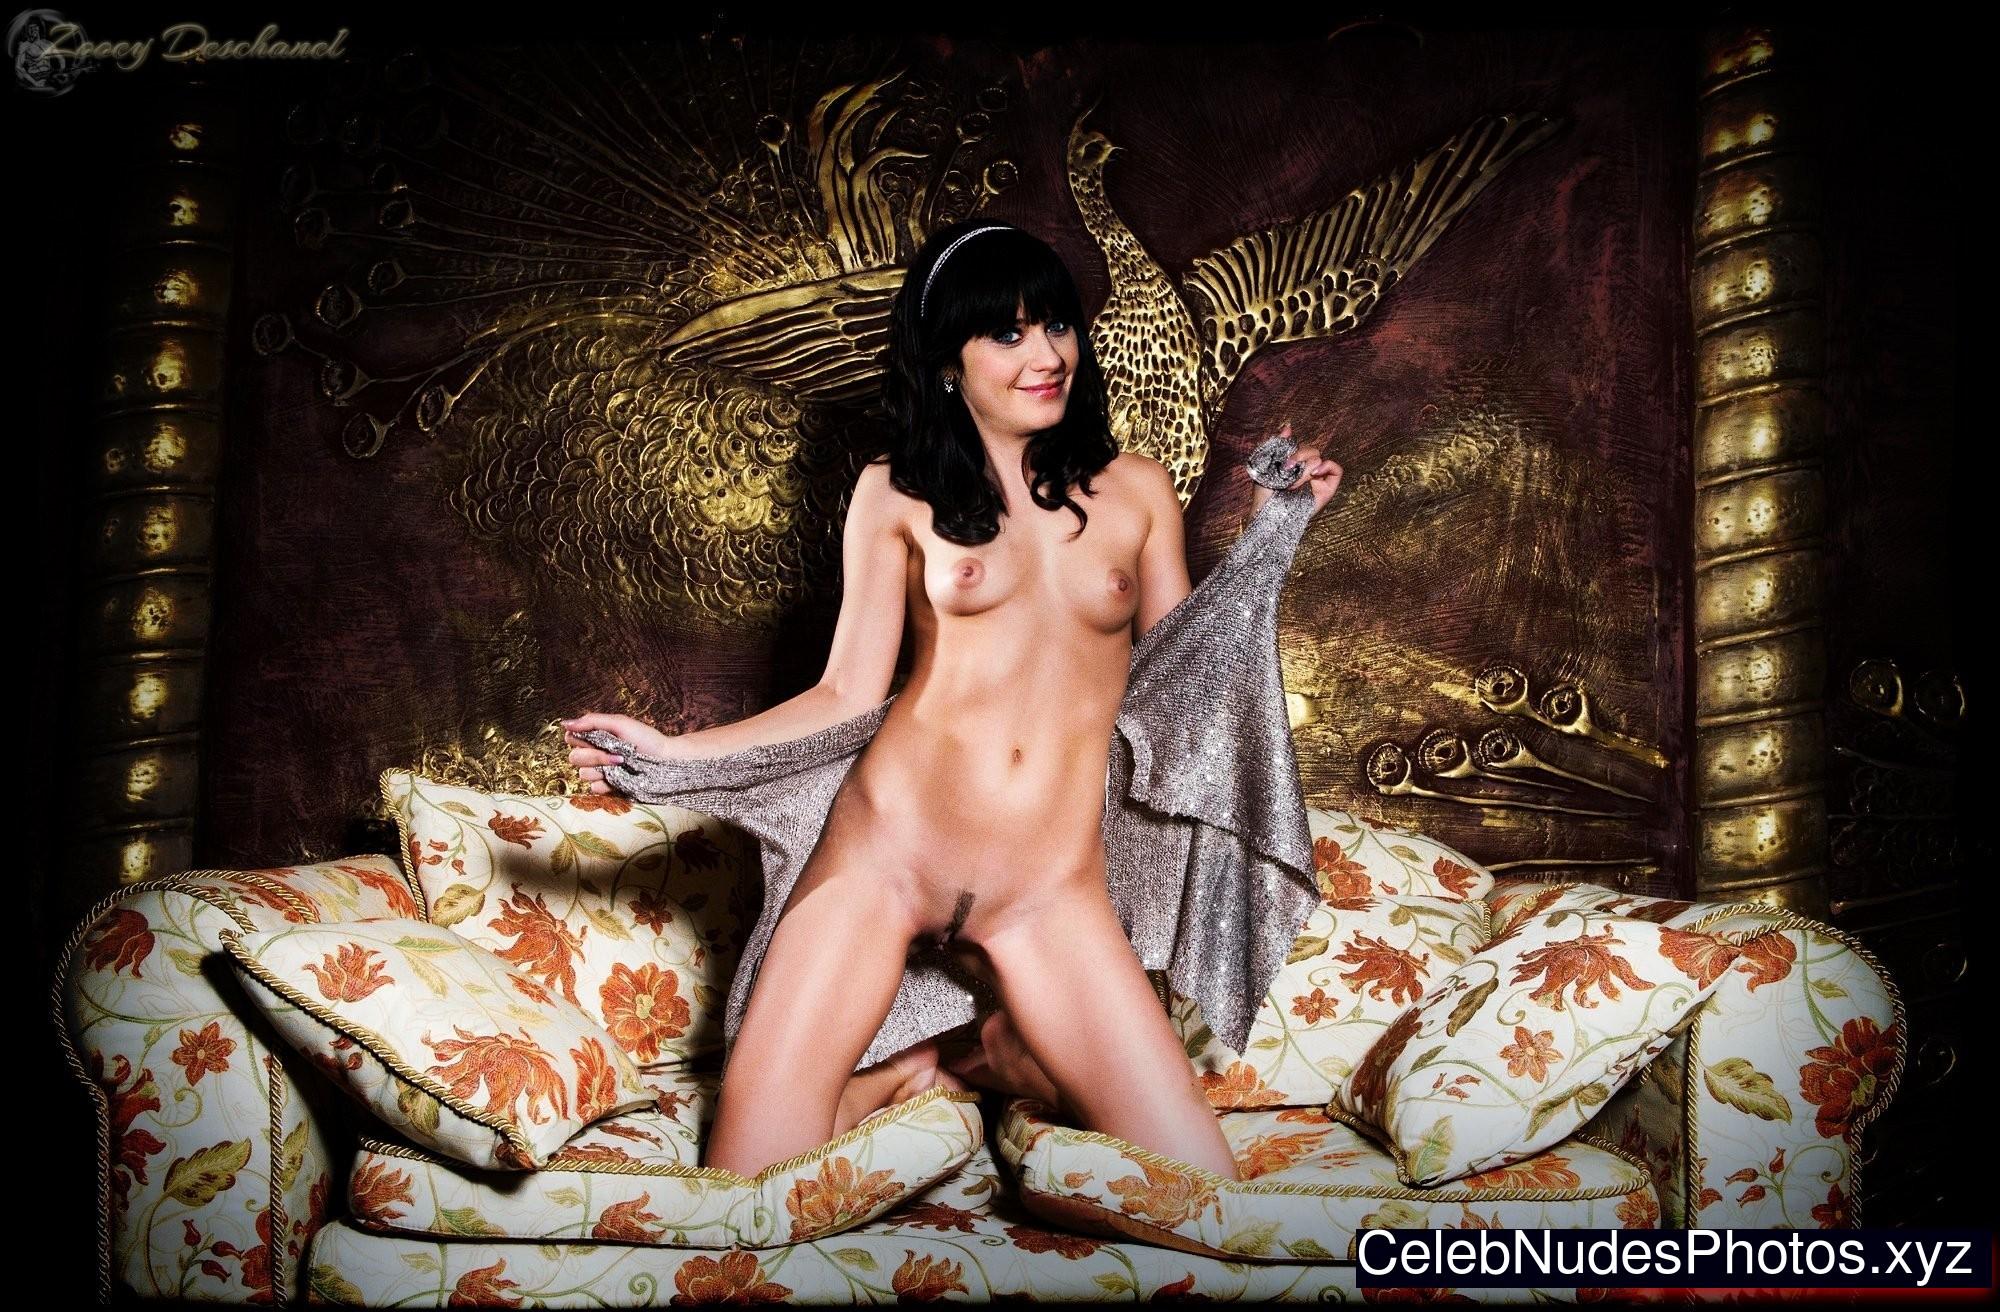 Zooey Deschanel celeb nude